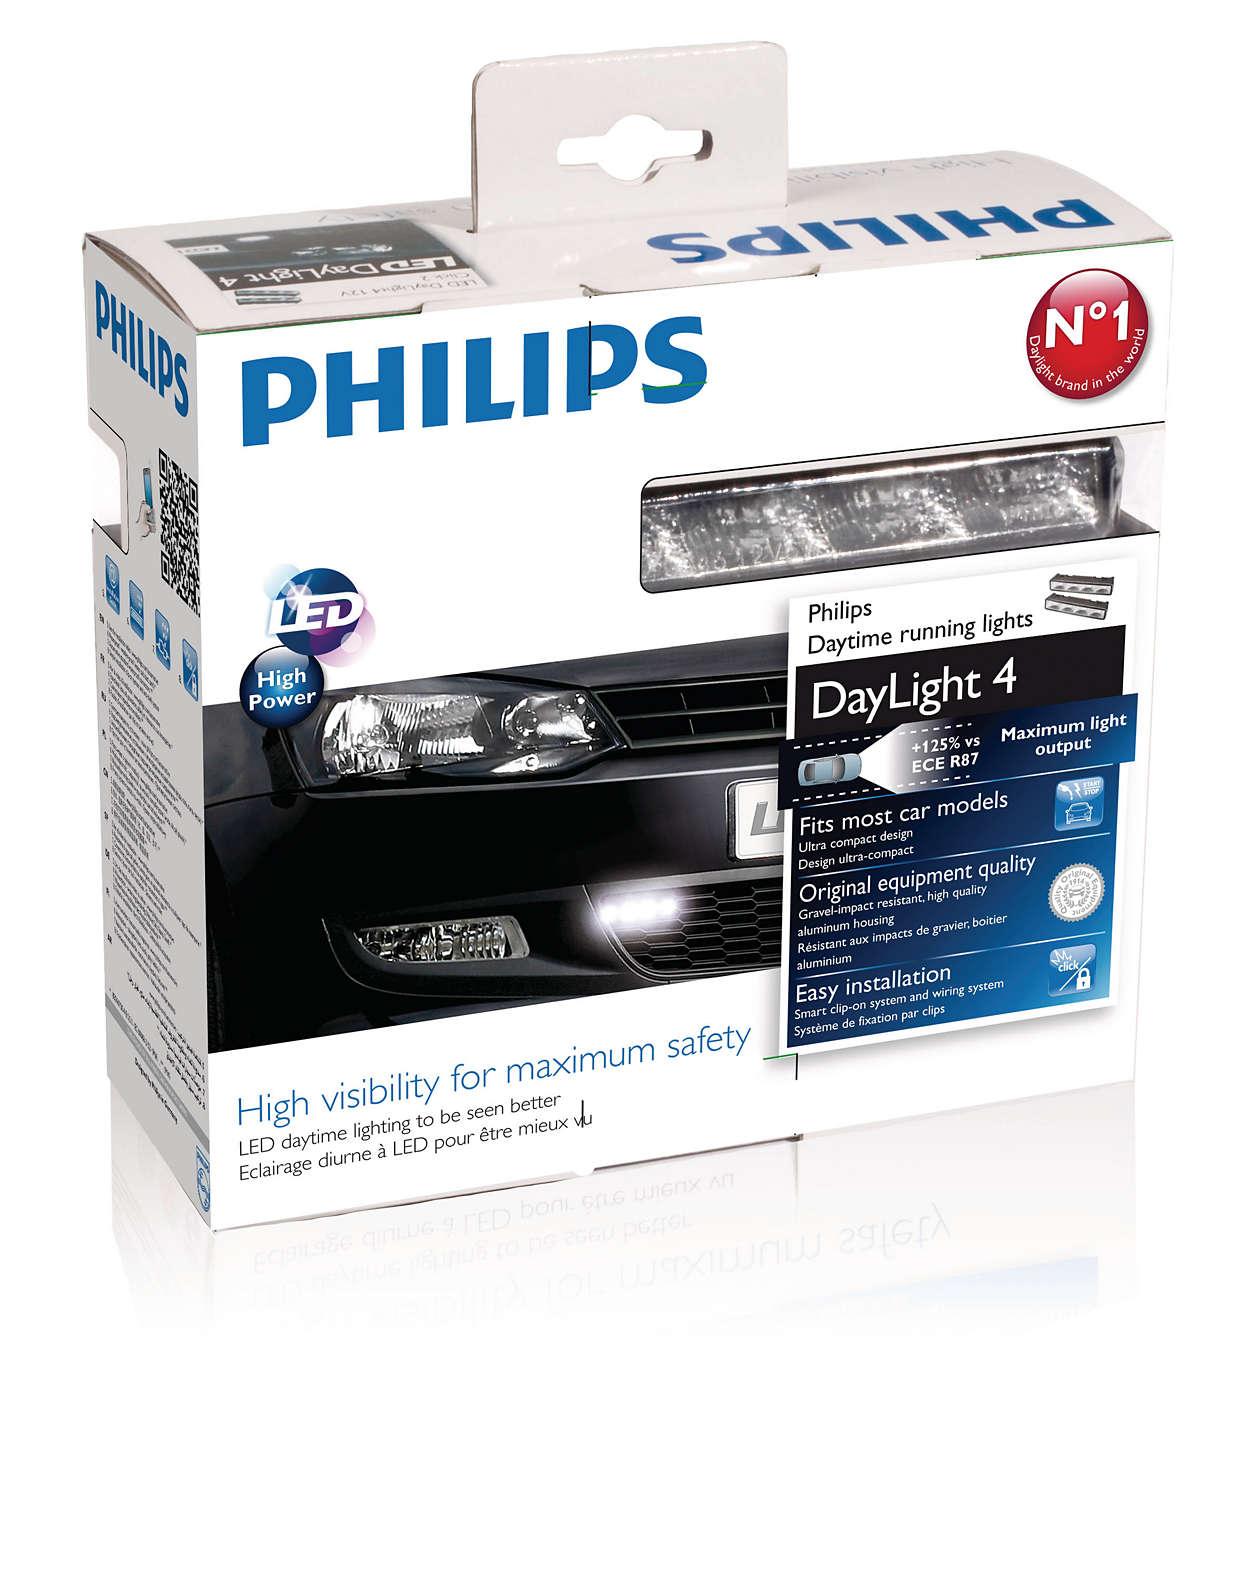 DayLight 4 LED Daytime running lights 12831ACCX1   Philips